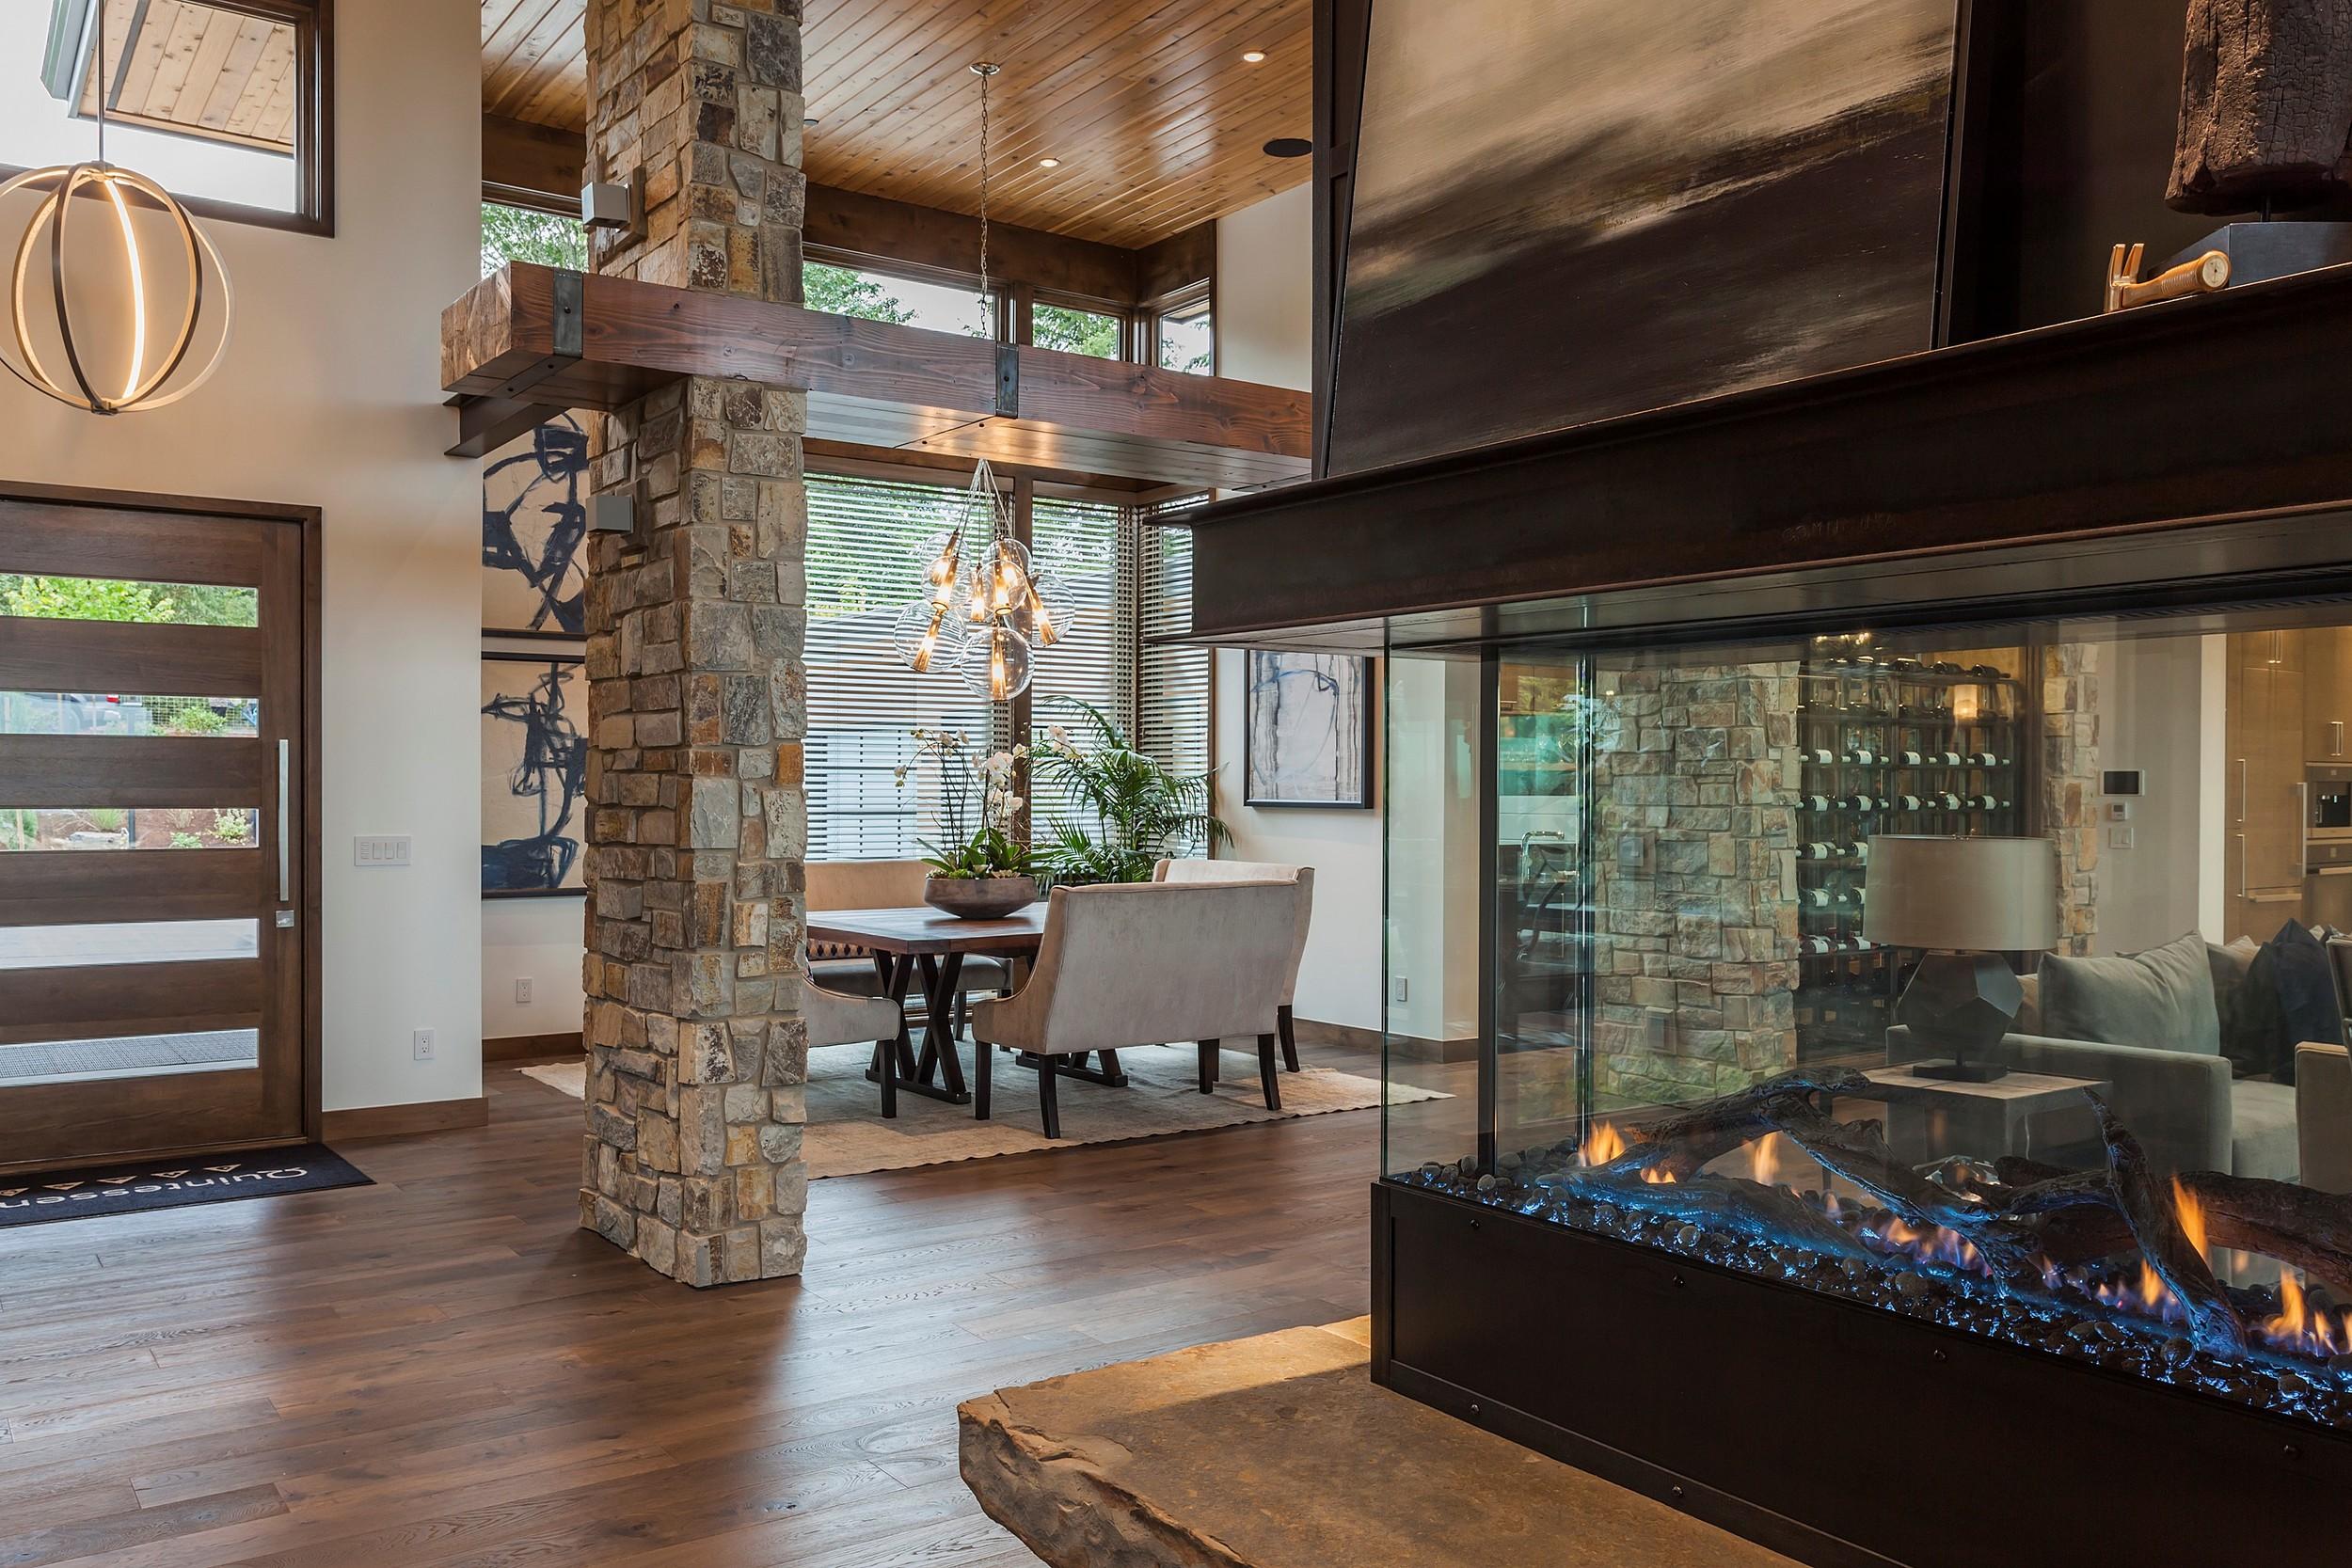 Fireplace & Dining